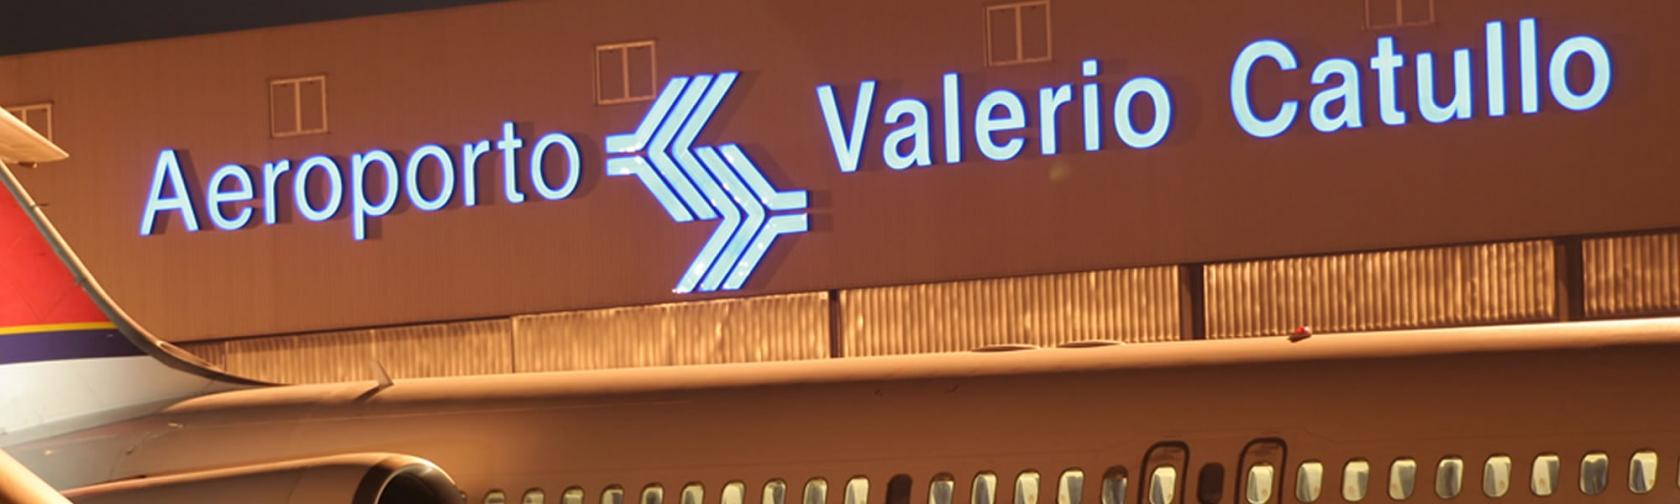 Aeroporto Verona Arrivi : Aeroporto di verona